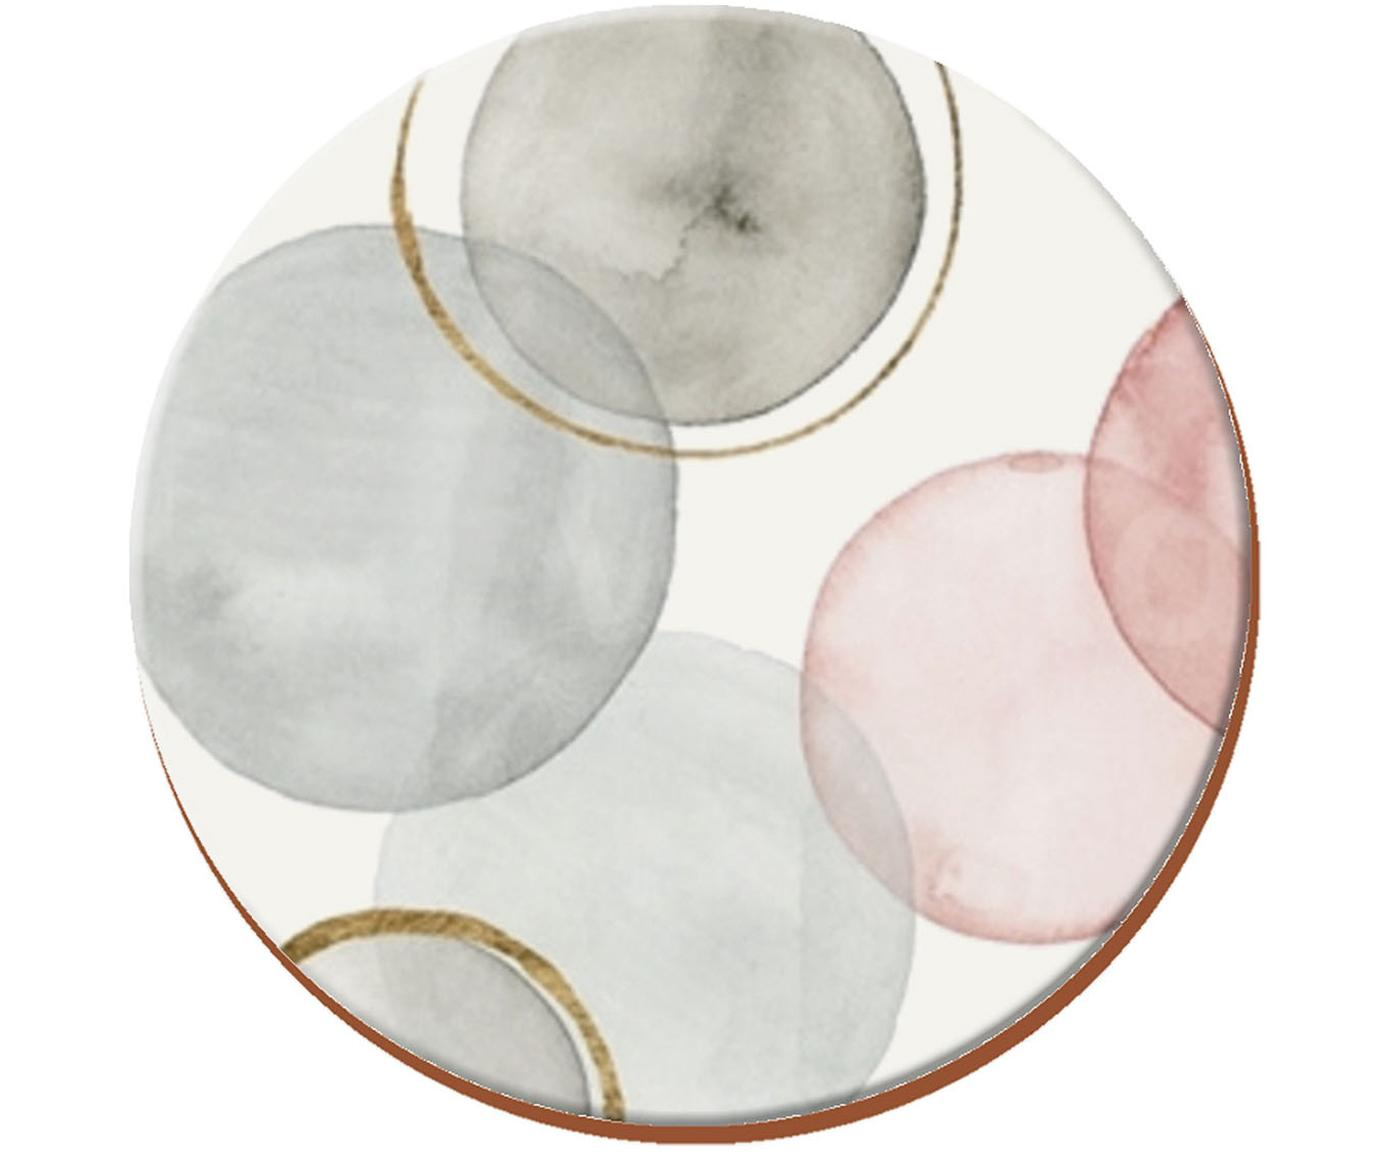 Untersetzer Gilded Spheres, 4 Stück, Kork, Weiss, Grau, Rosa, Ø 12 cm